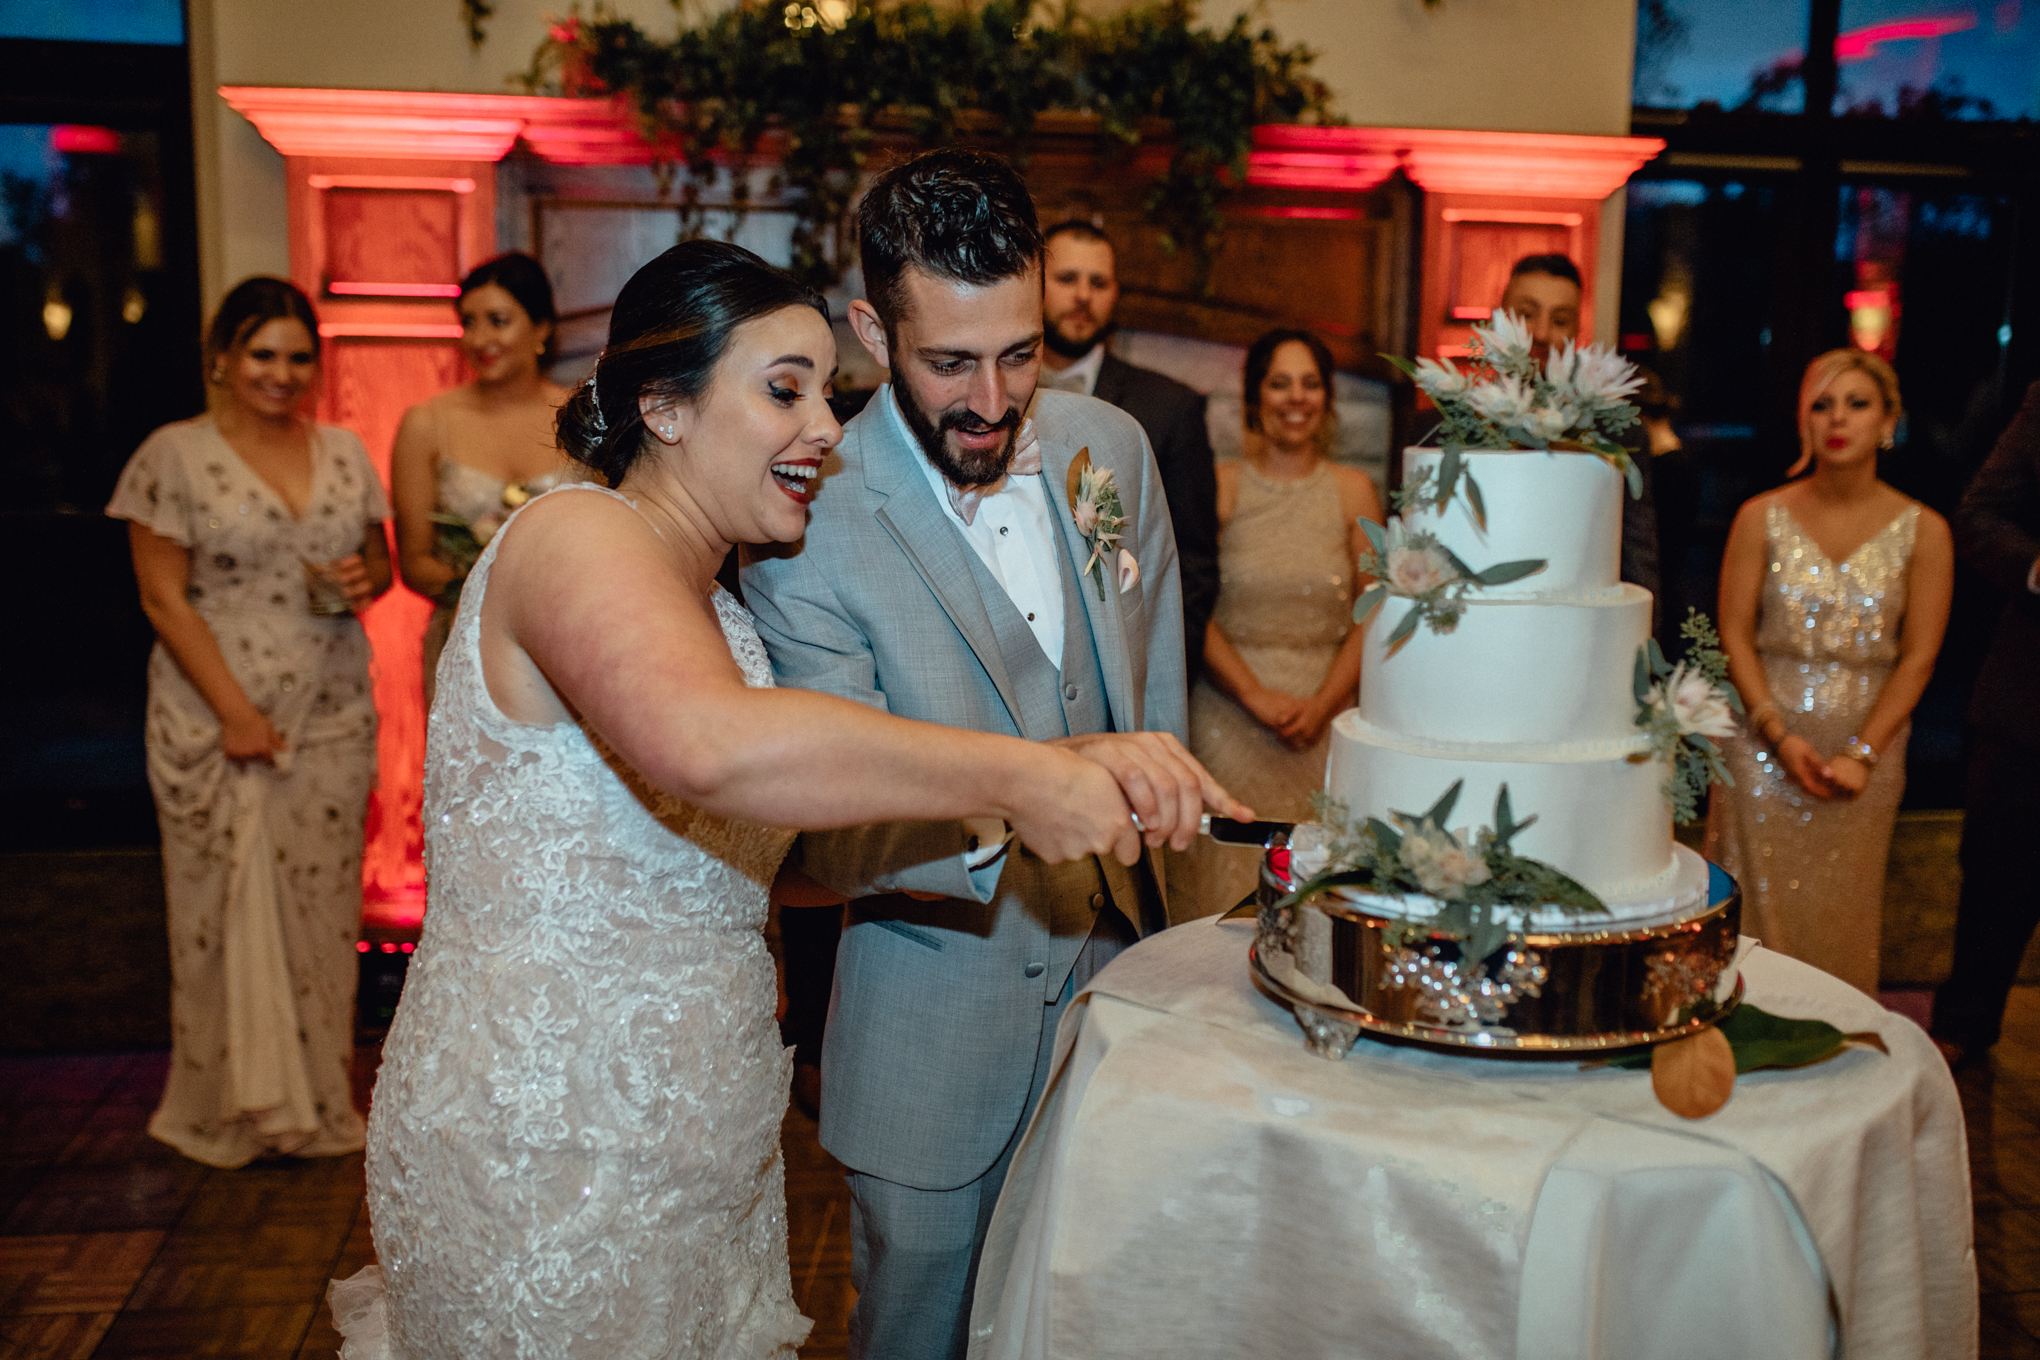 bride-and-groom-cutting-cake-at-brandybrook.jpg